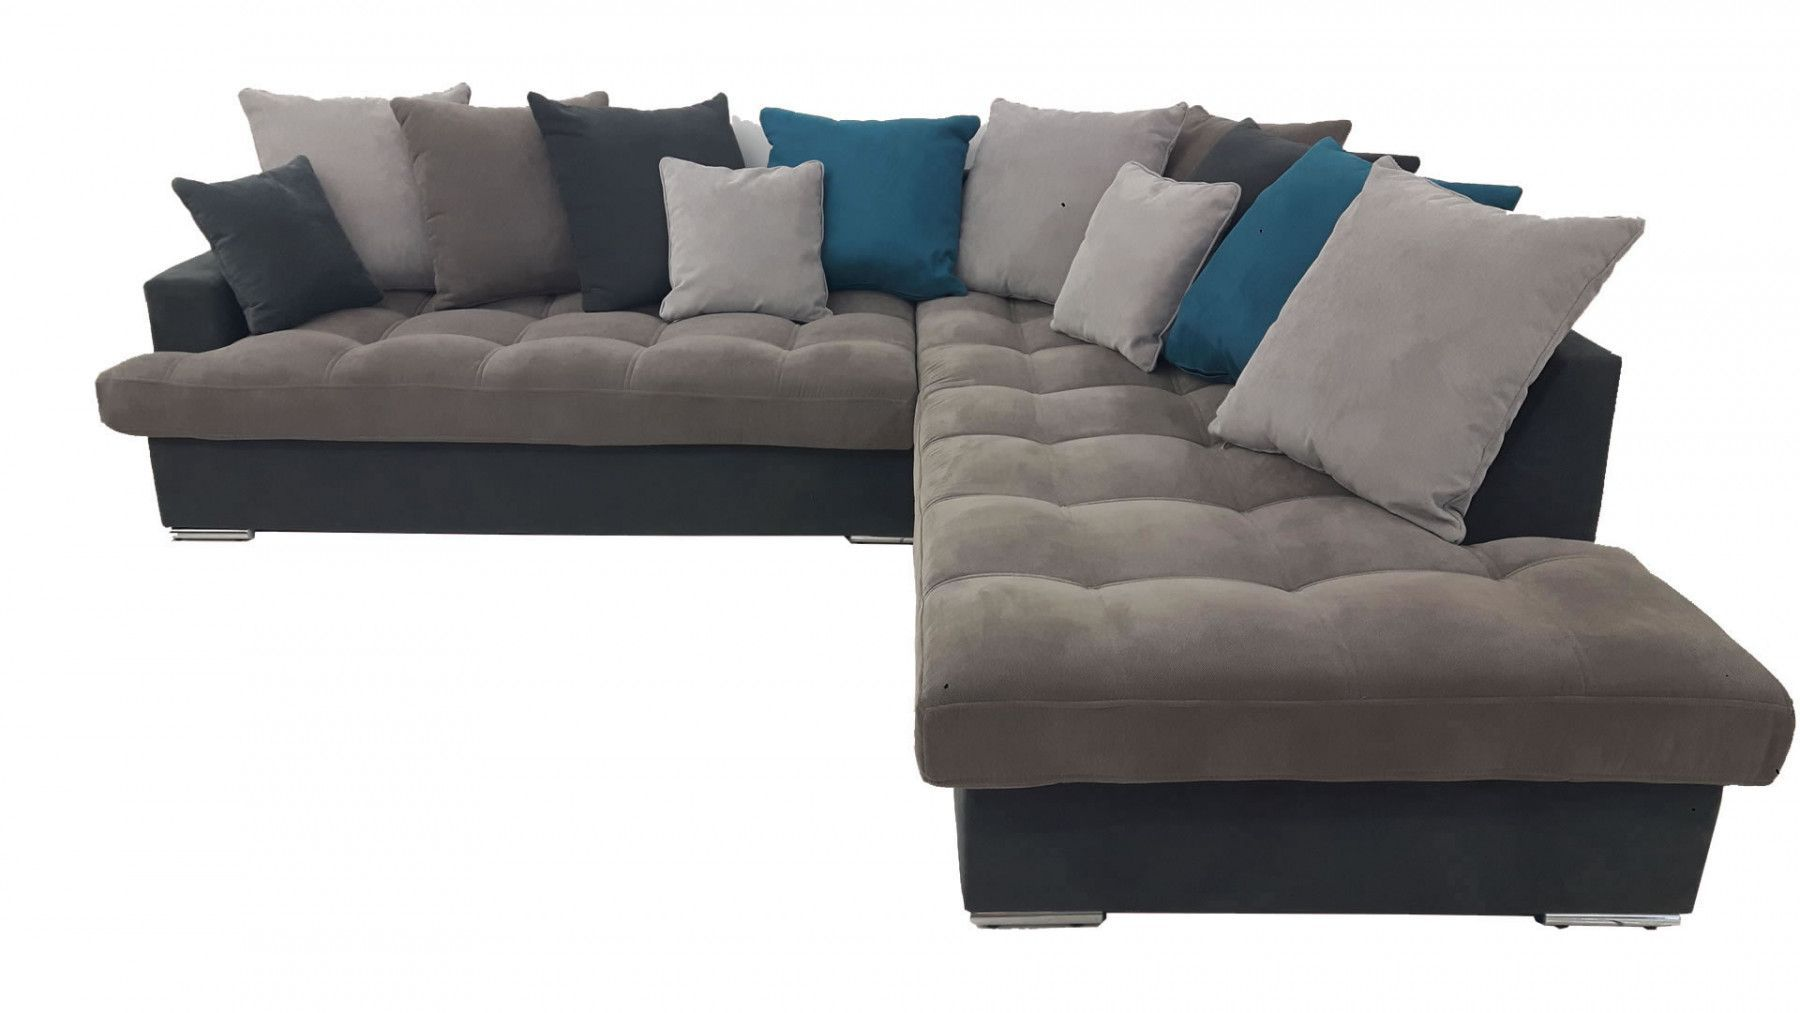 canap s d 39 angle canap d 39 angle droite linda gris et bleu. Black Bedroom Furniture Sets. Home Design Ideas